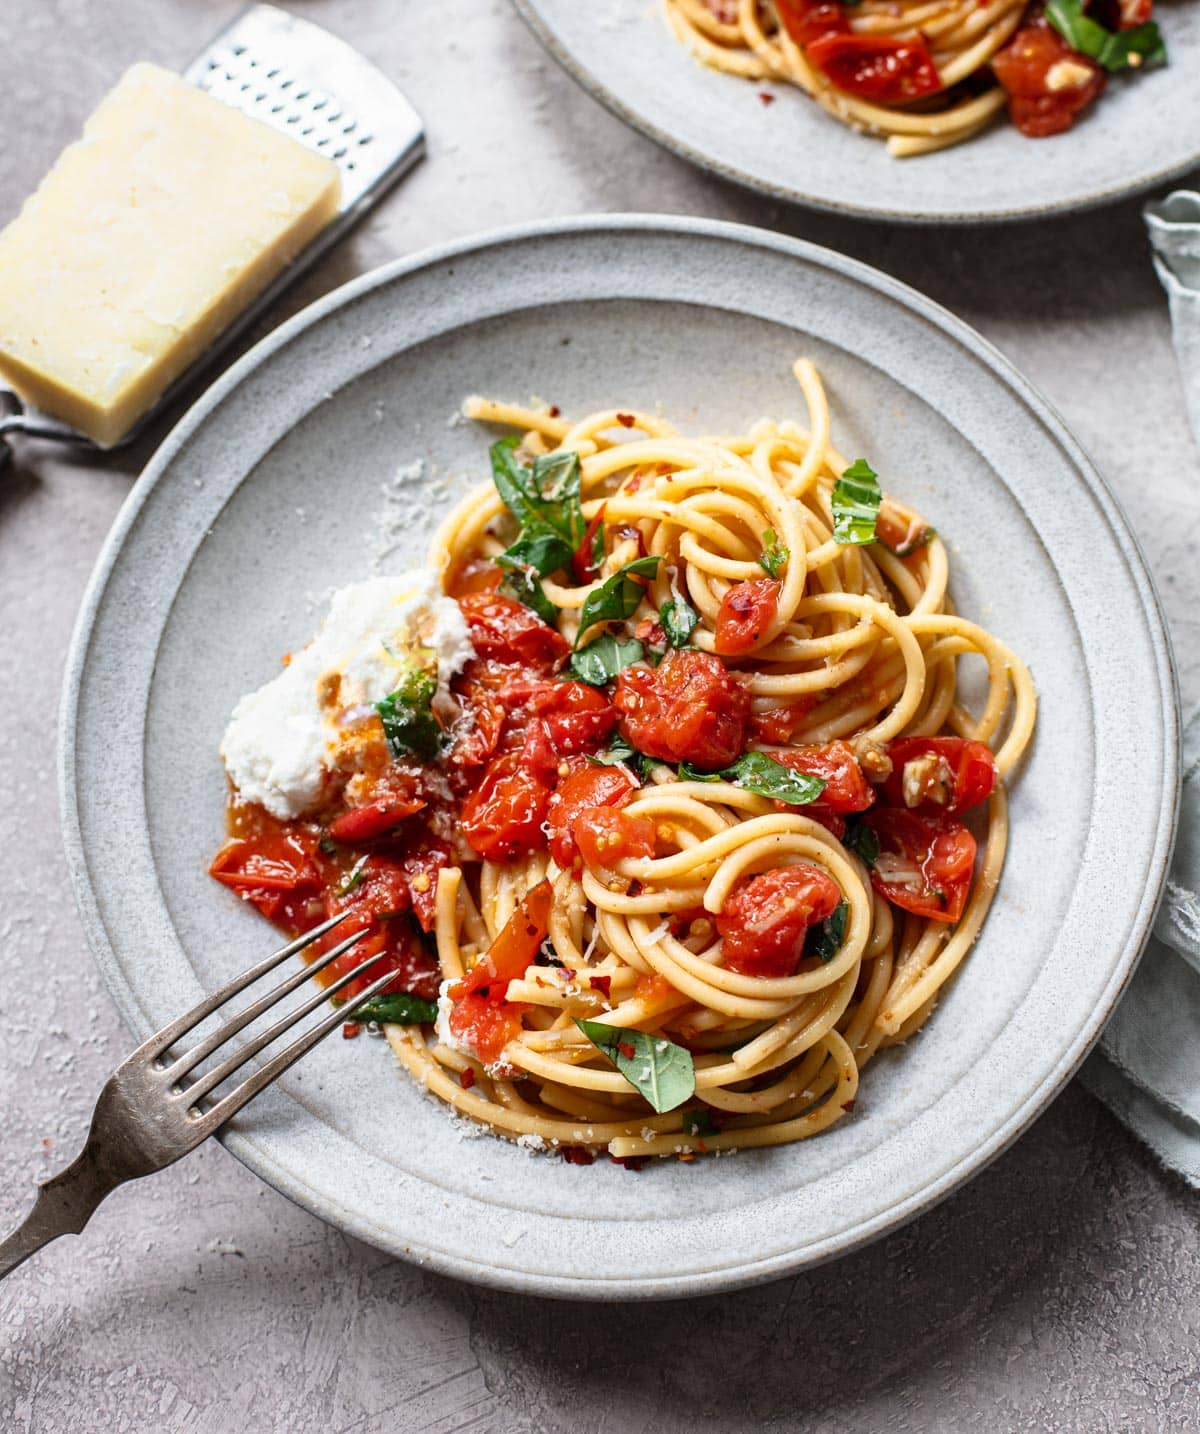 Bucatini Pasta with Sheet Pan Tomato Sauce